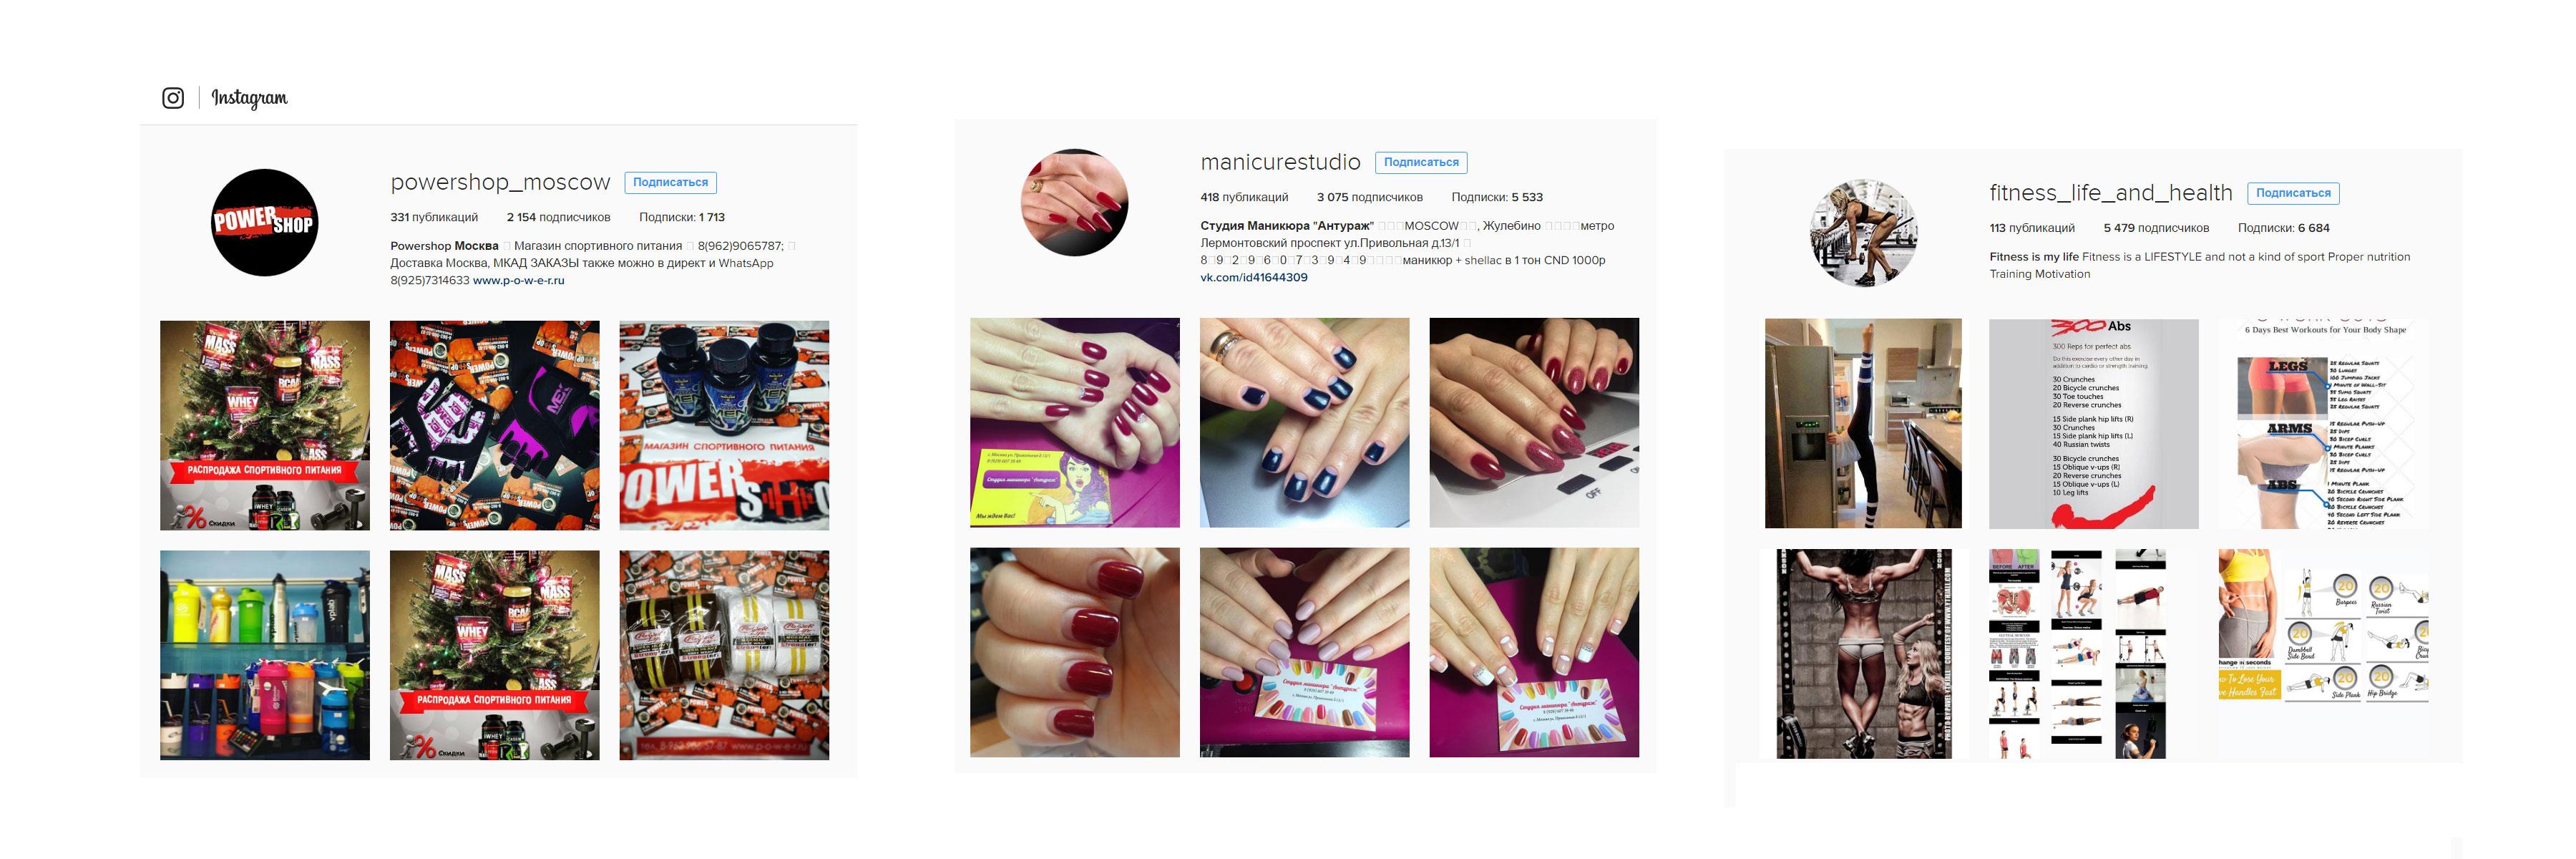 promotions-instagram